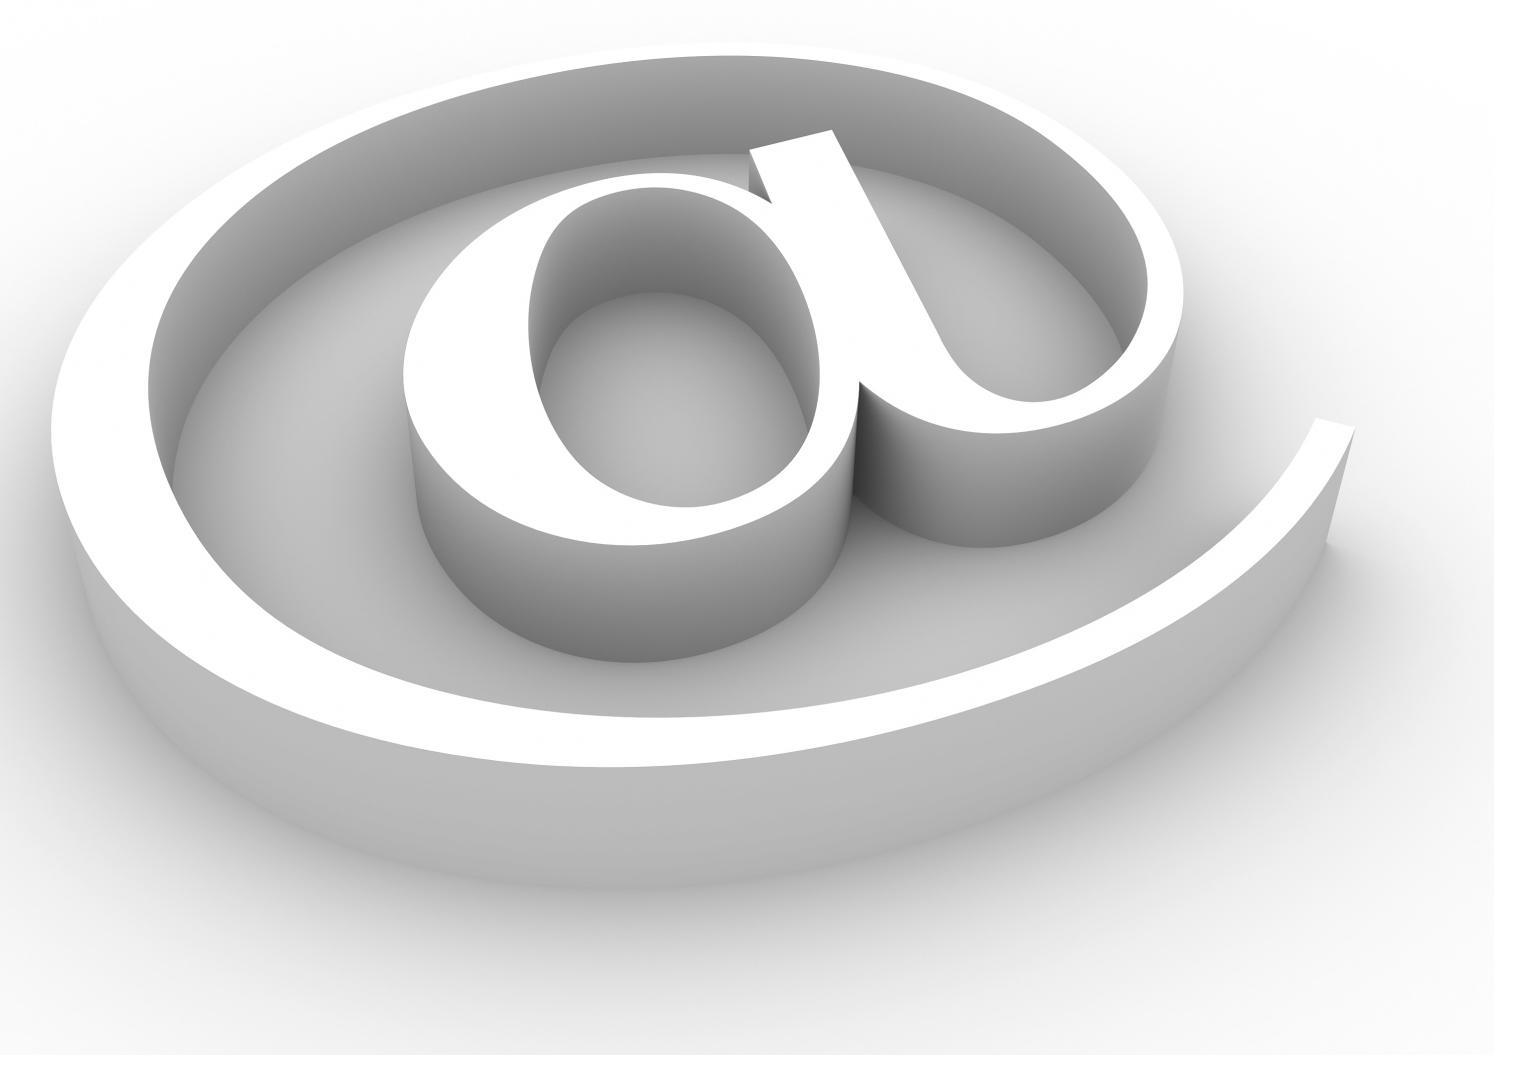 Image of an @ symbol.